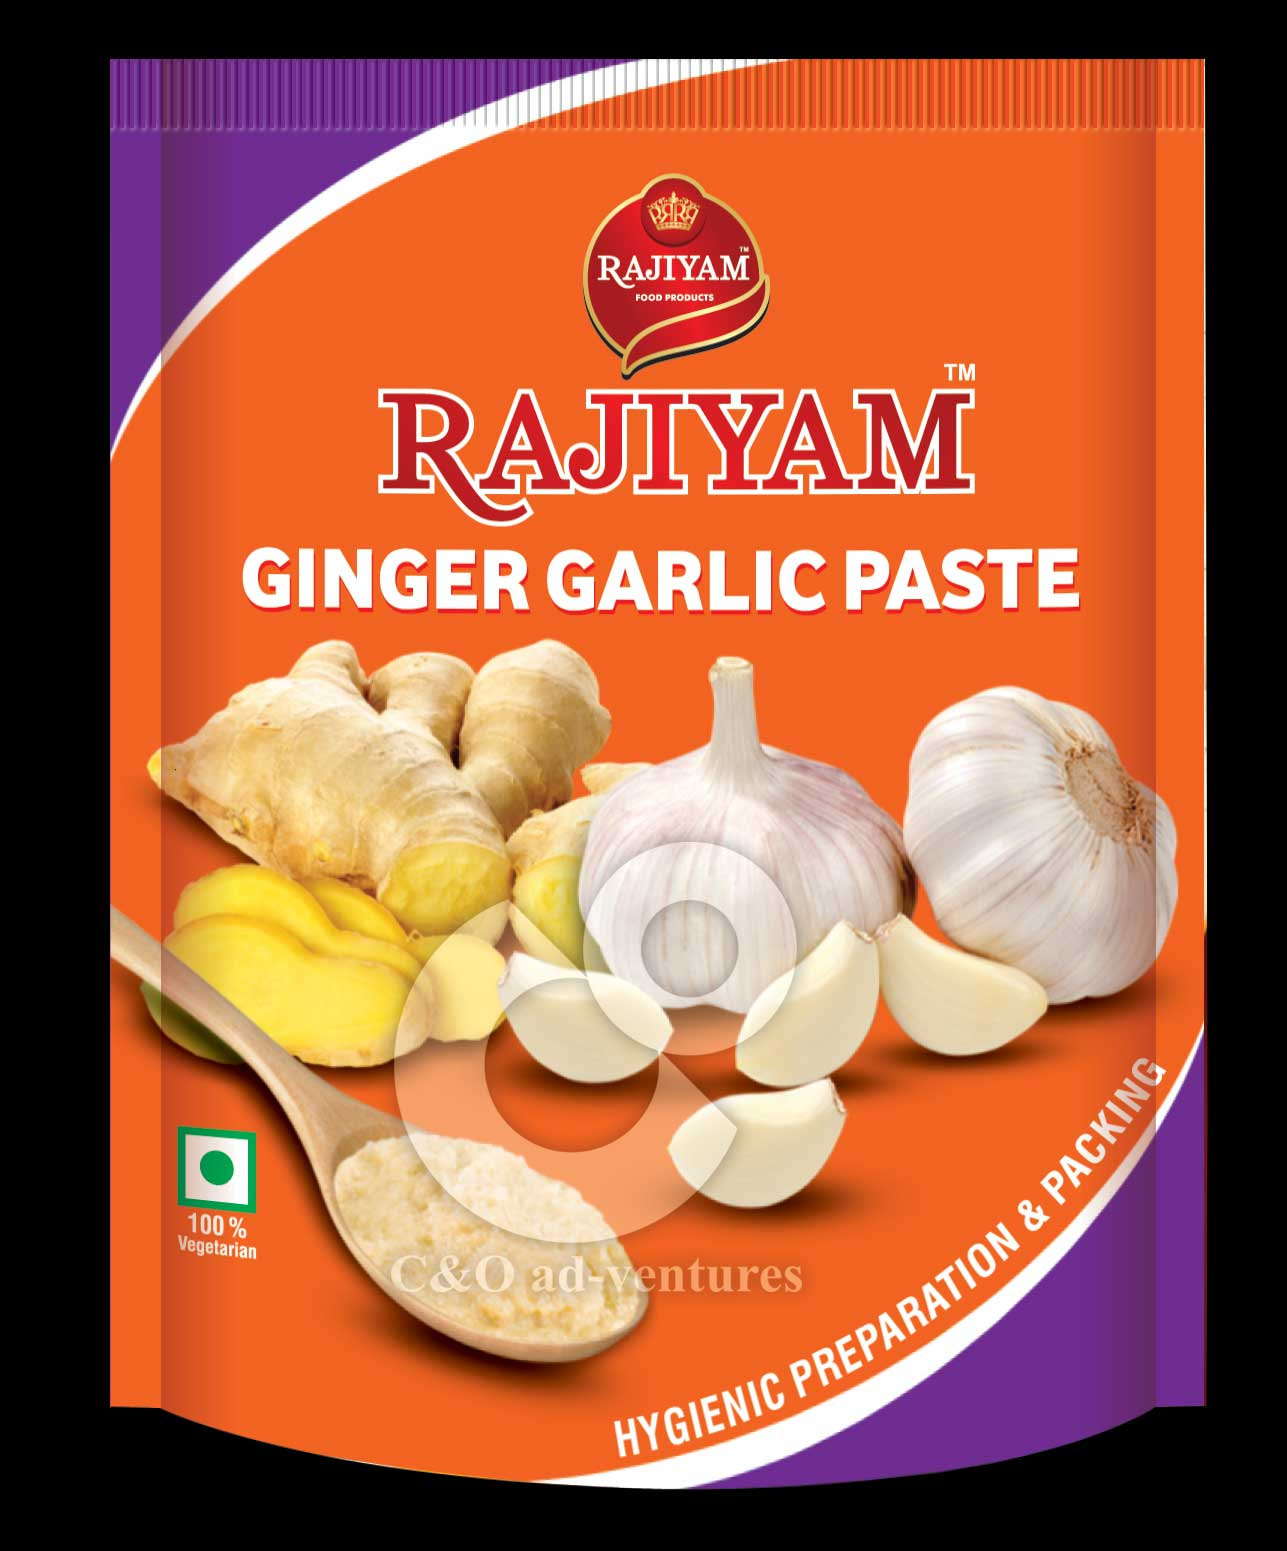 Package Design for Ginger Garlic Paste